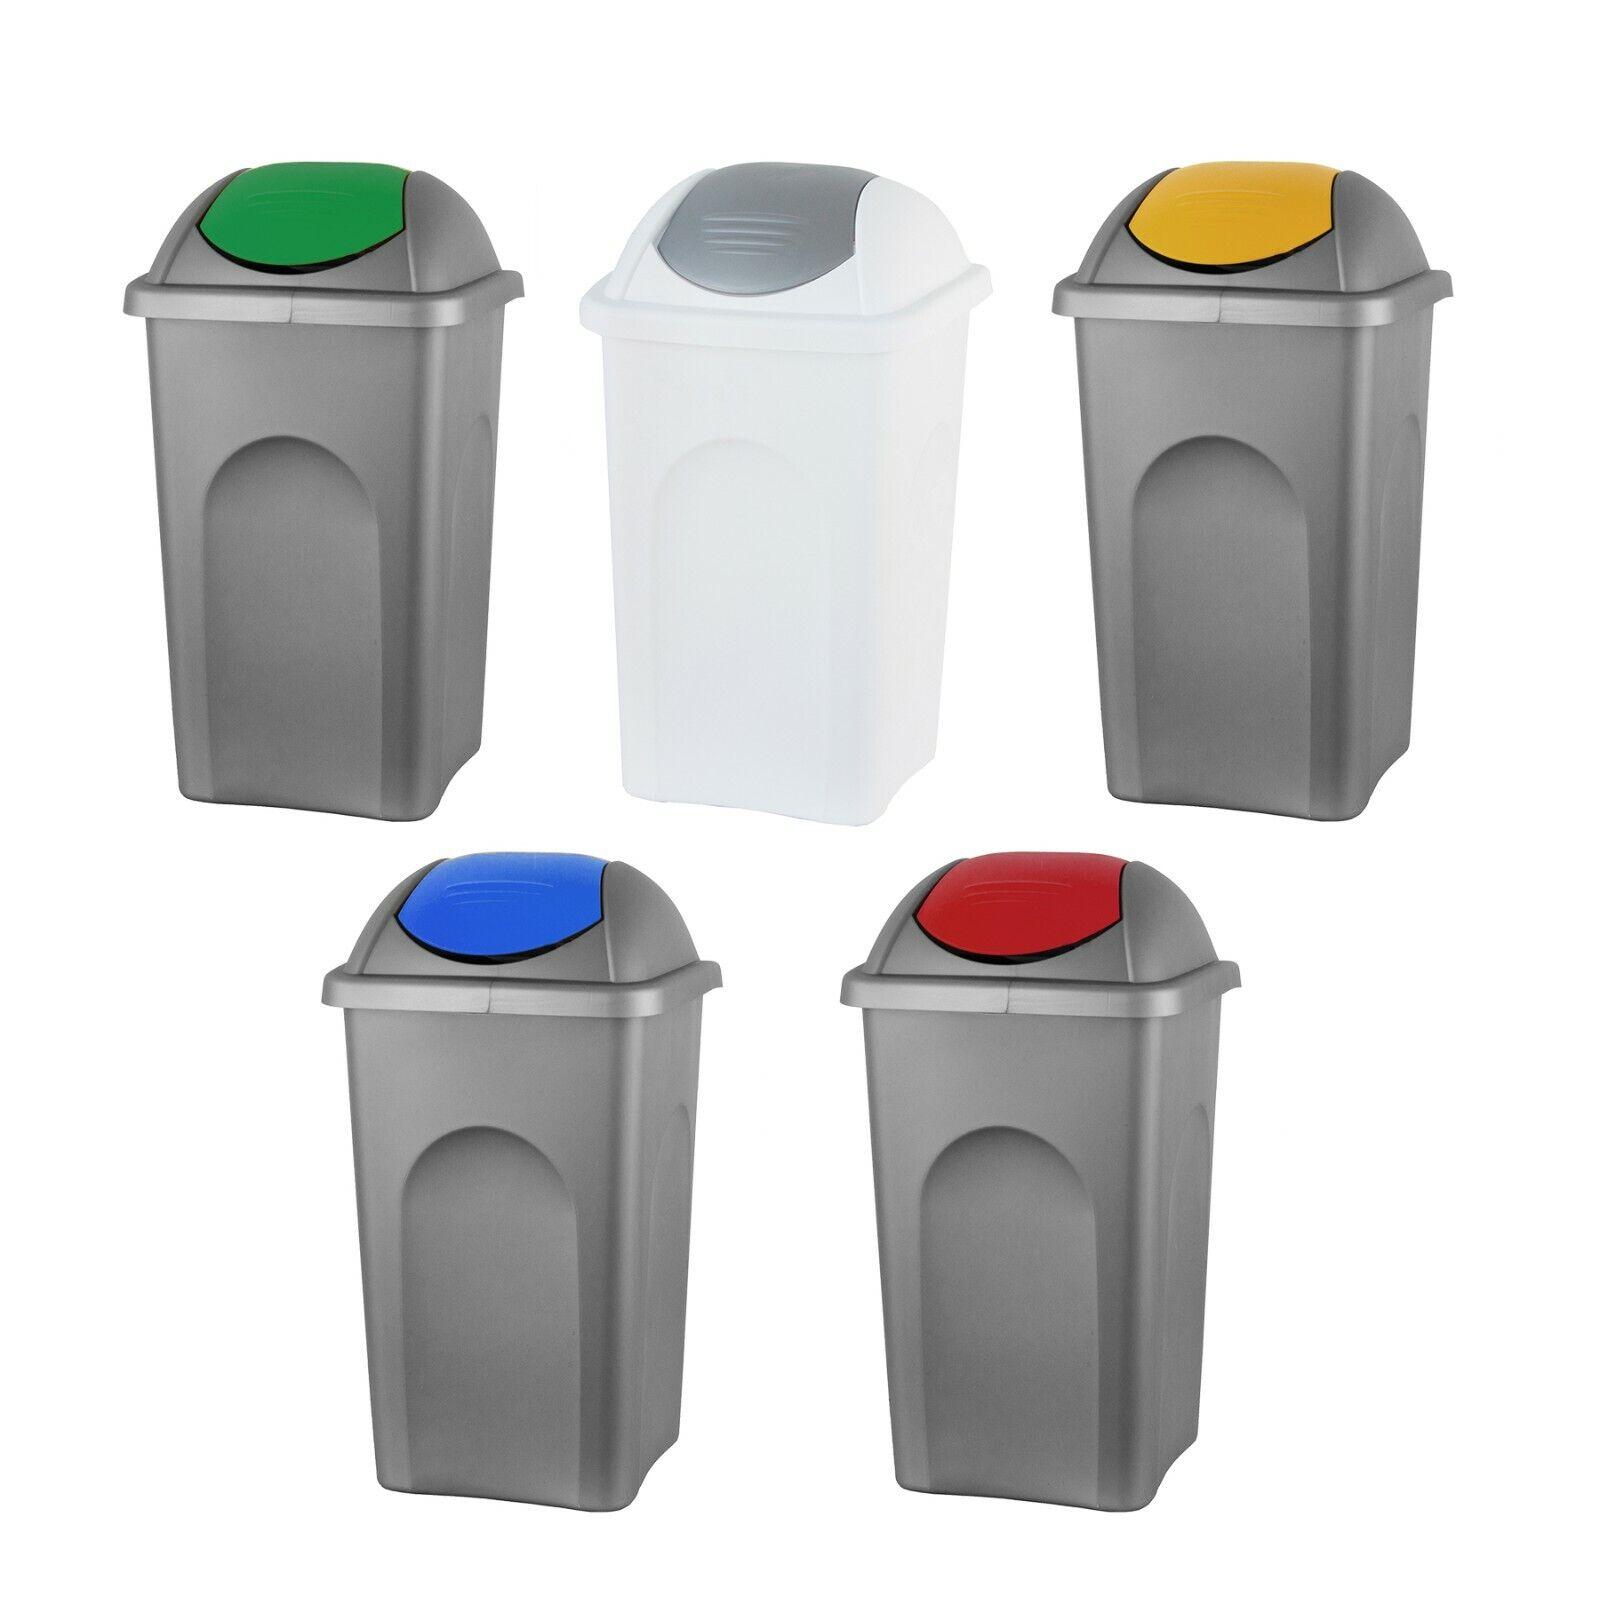 Mülleimer 60L groß Schwingdeckel Abfall Sammler Behälter Müll Tonne Papierkorb